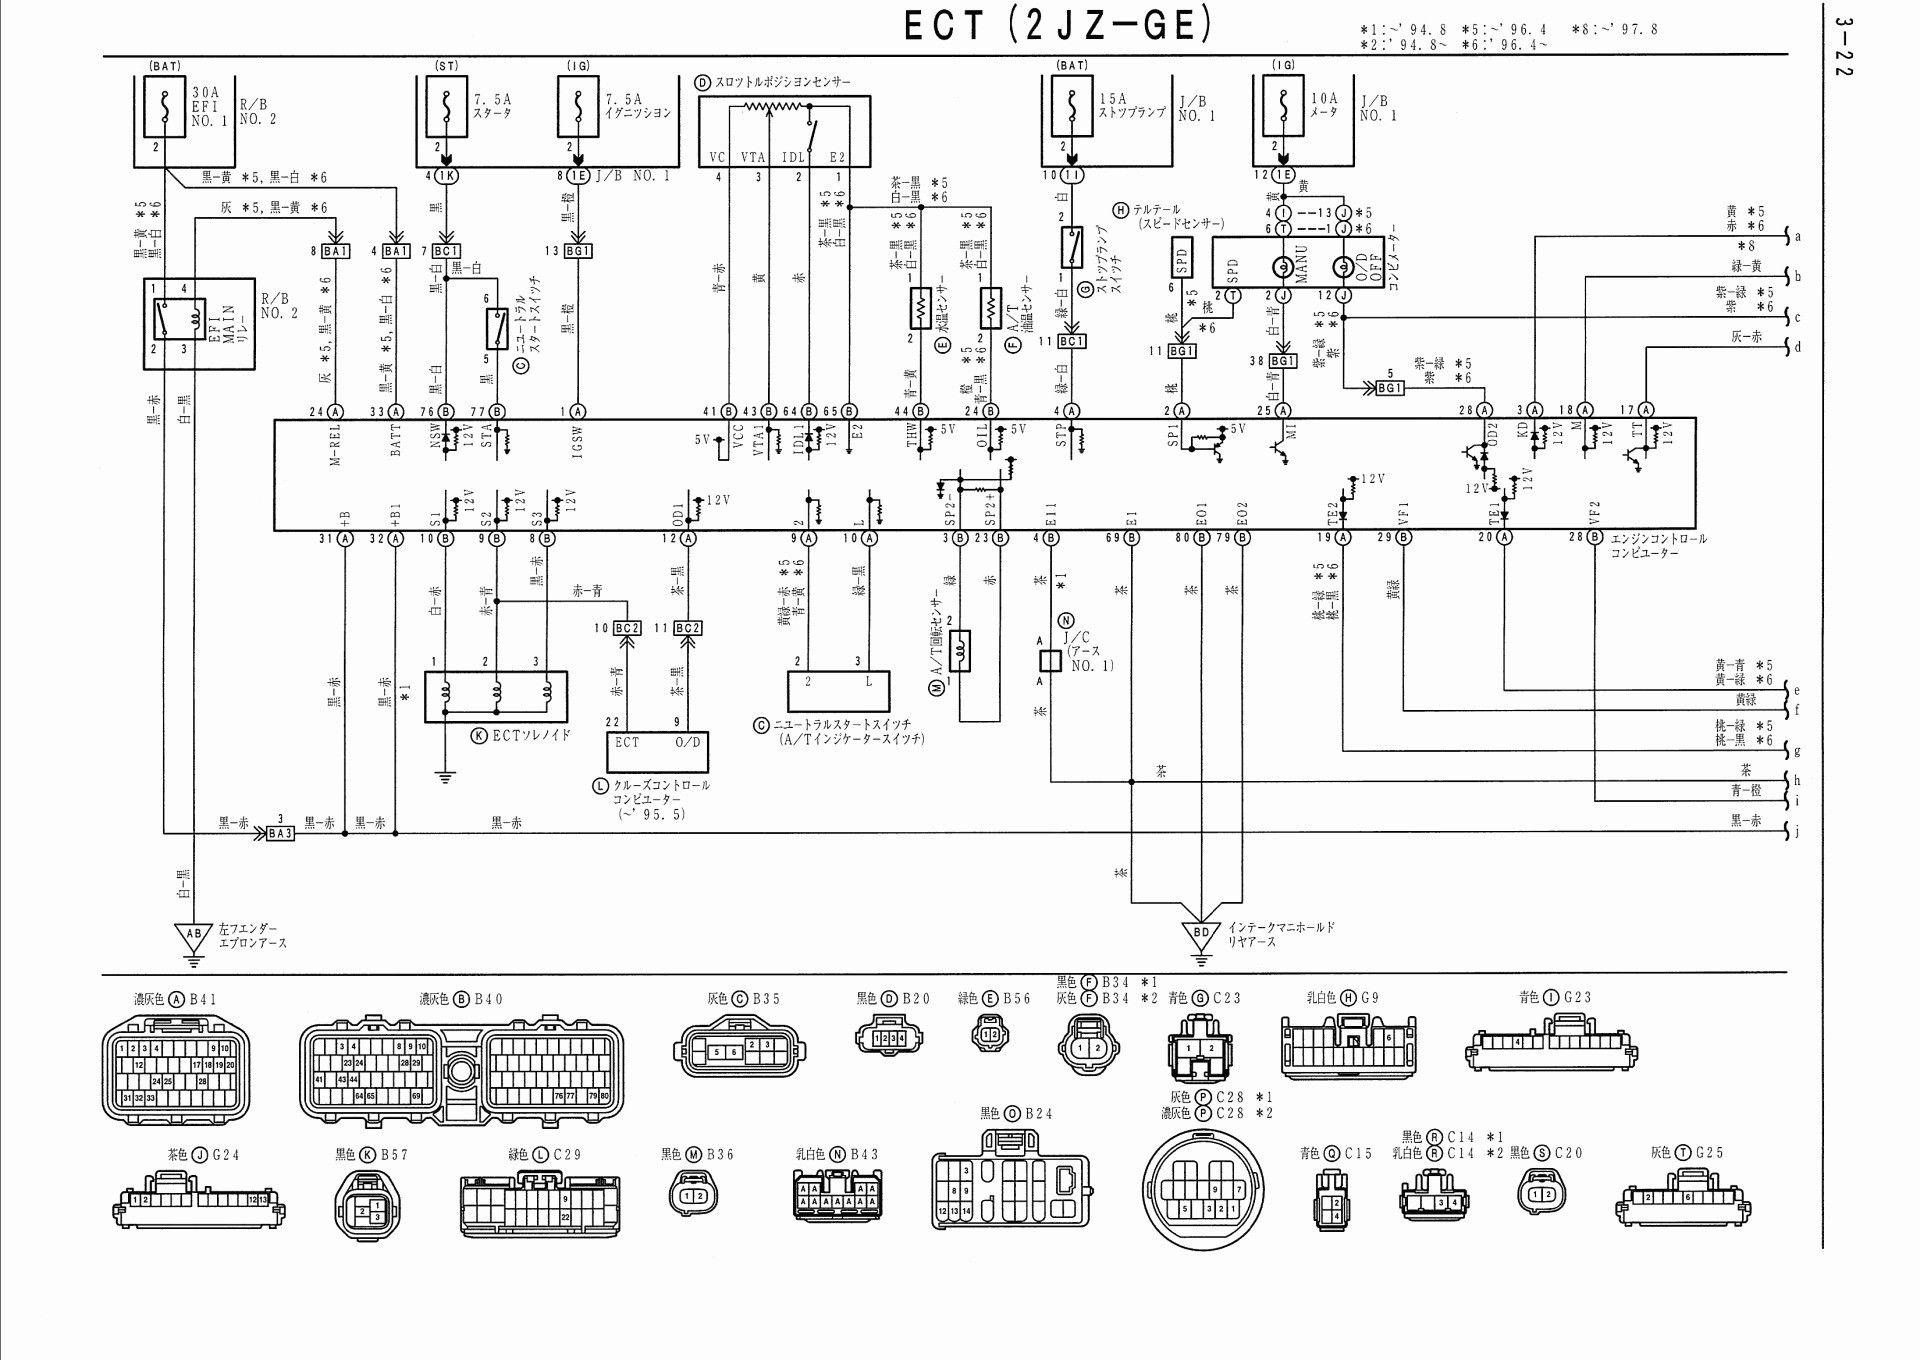 Bmw E46 Dme Wiring Diagram Diagram Diagramtemplate Diagramsample Electrical Diagram Diagram Bmw E46